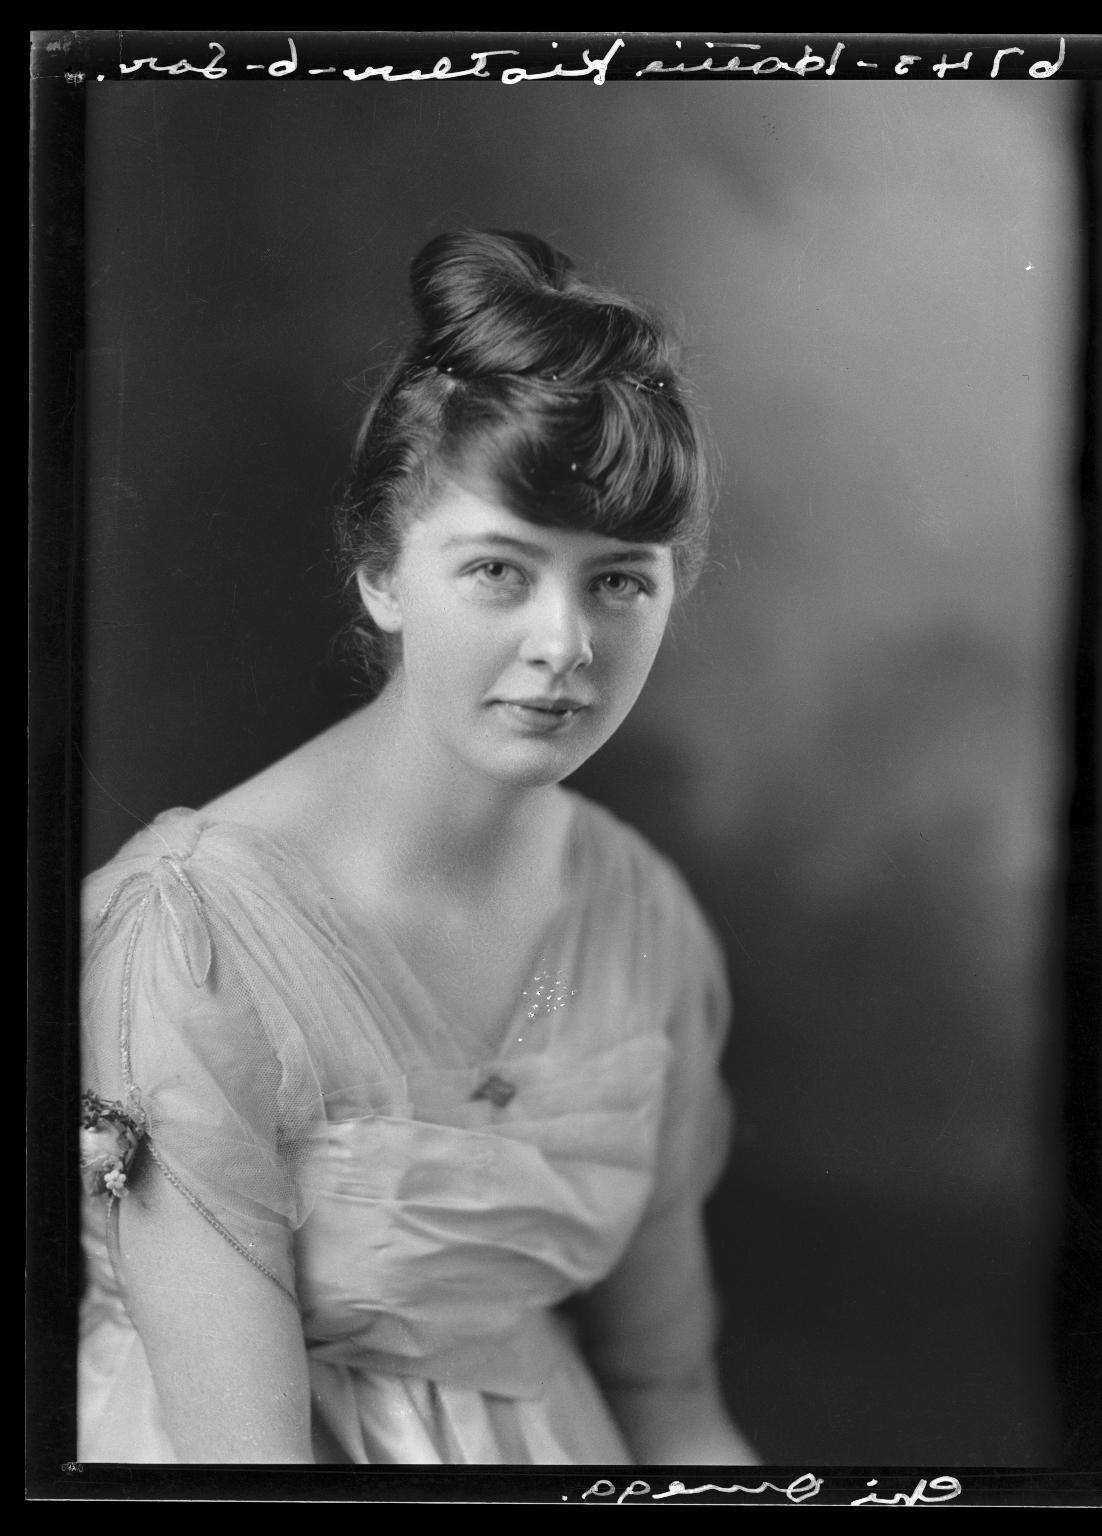 Portraits of Hattie Kistler